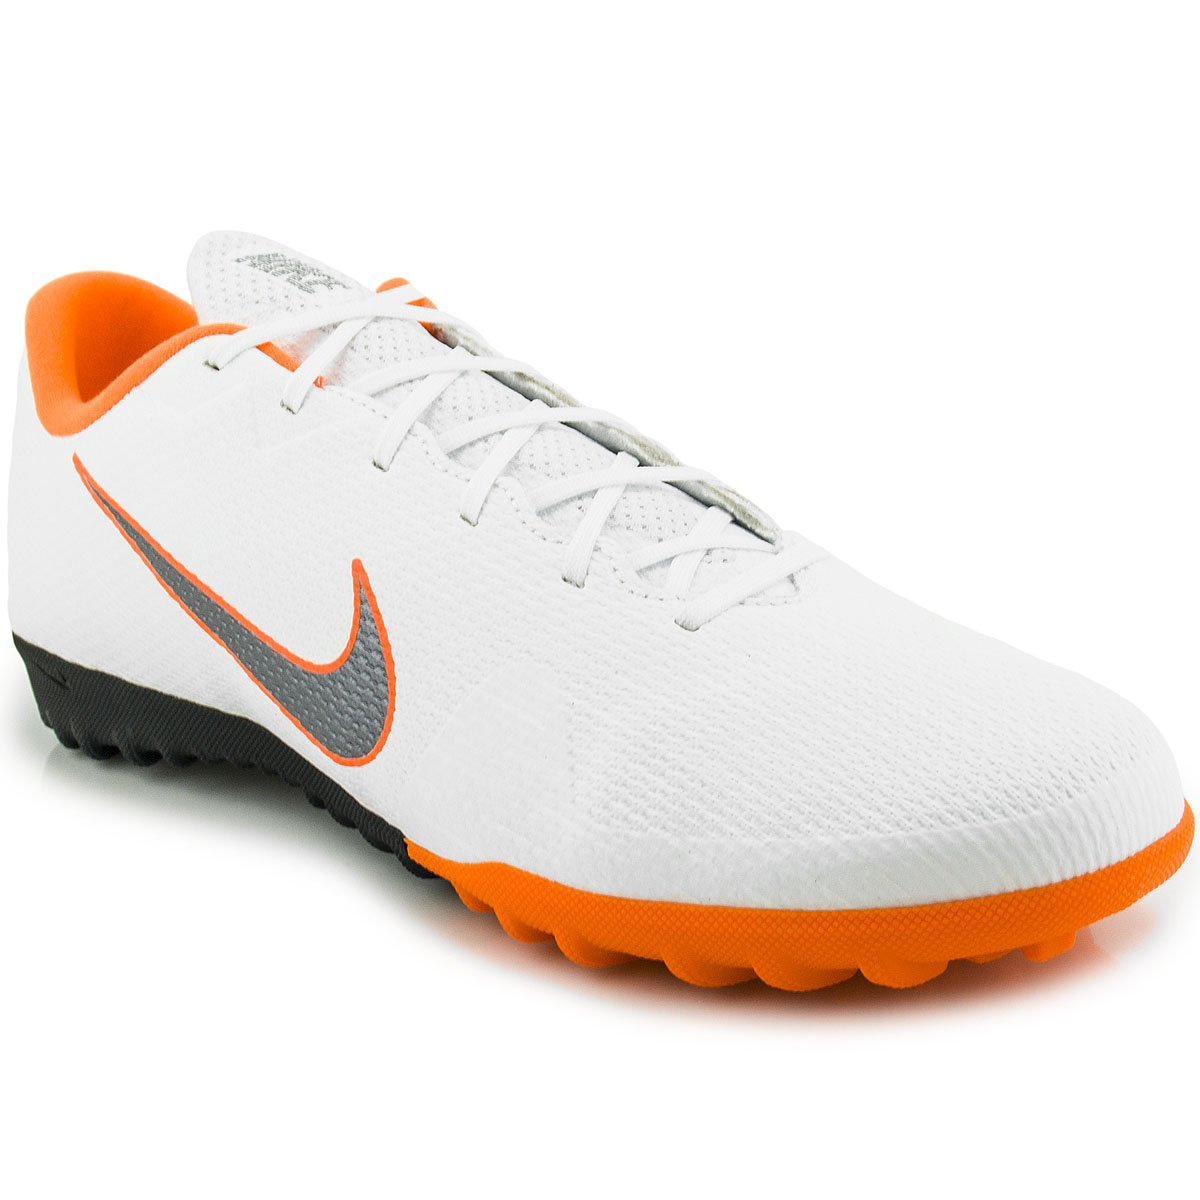 948a2ff6d29be Chuteira Nike MercurialX Vapor 12 Academy TF